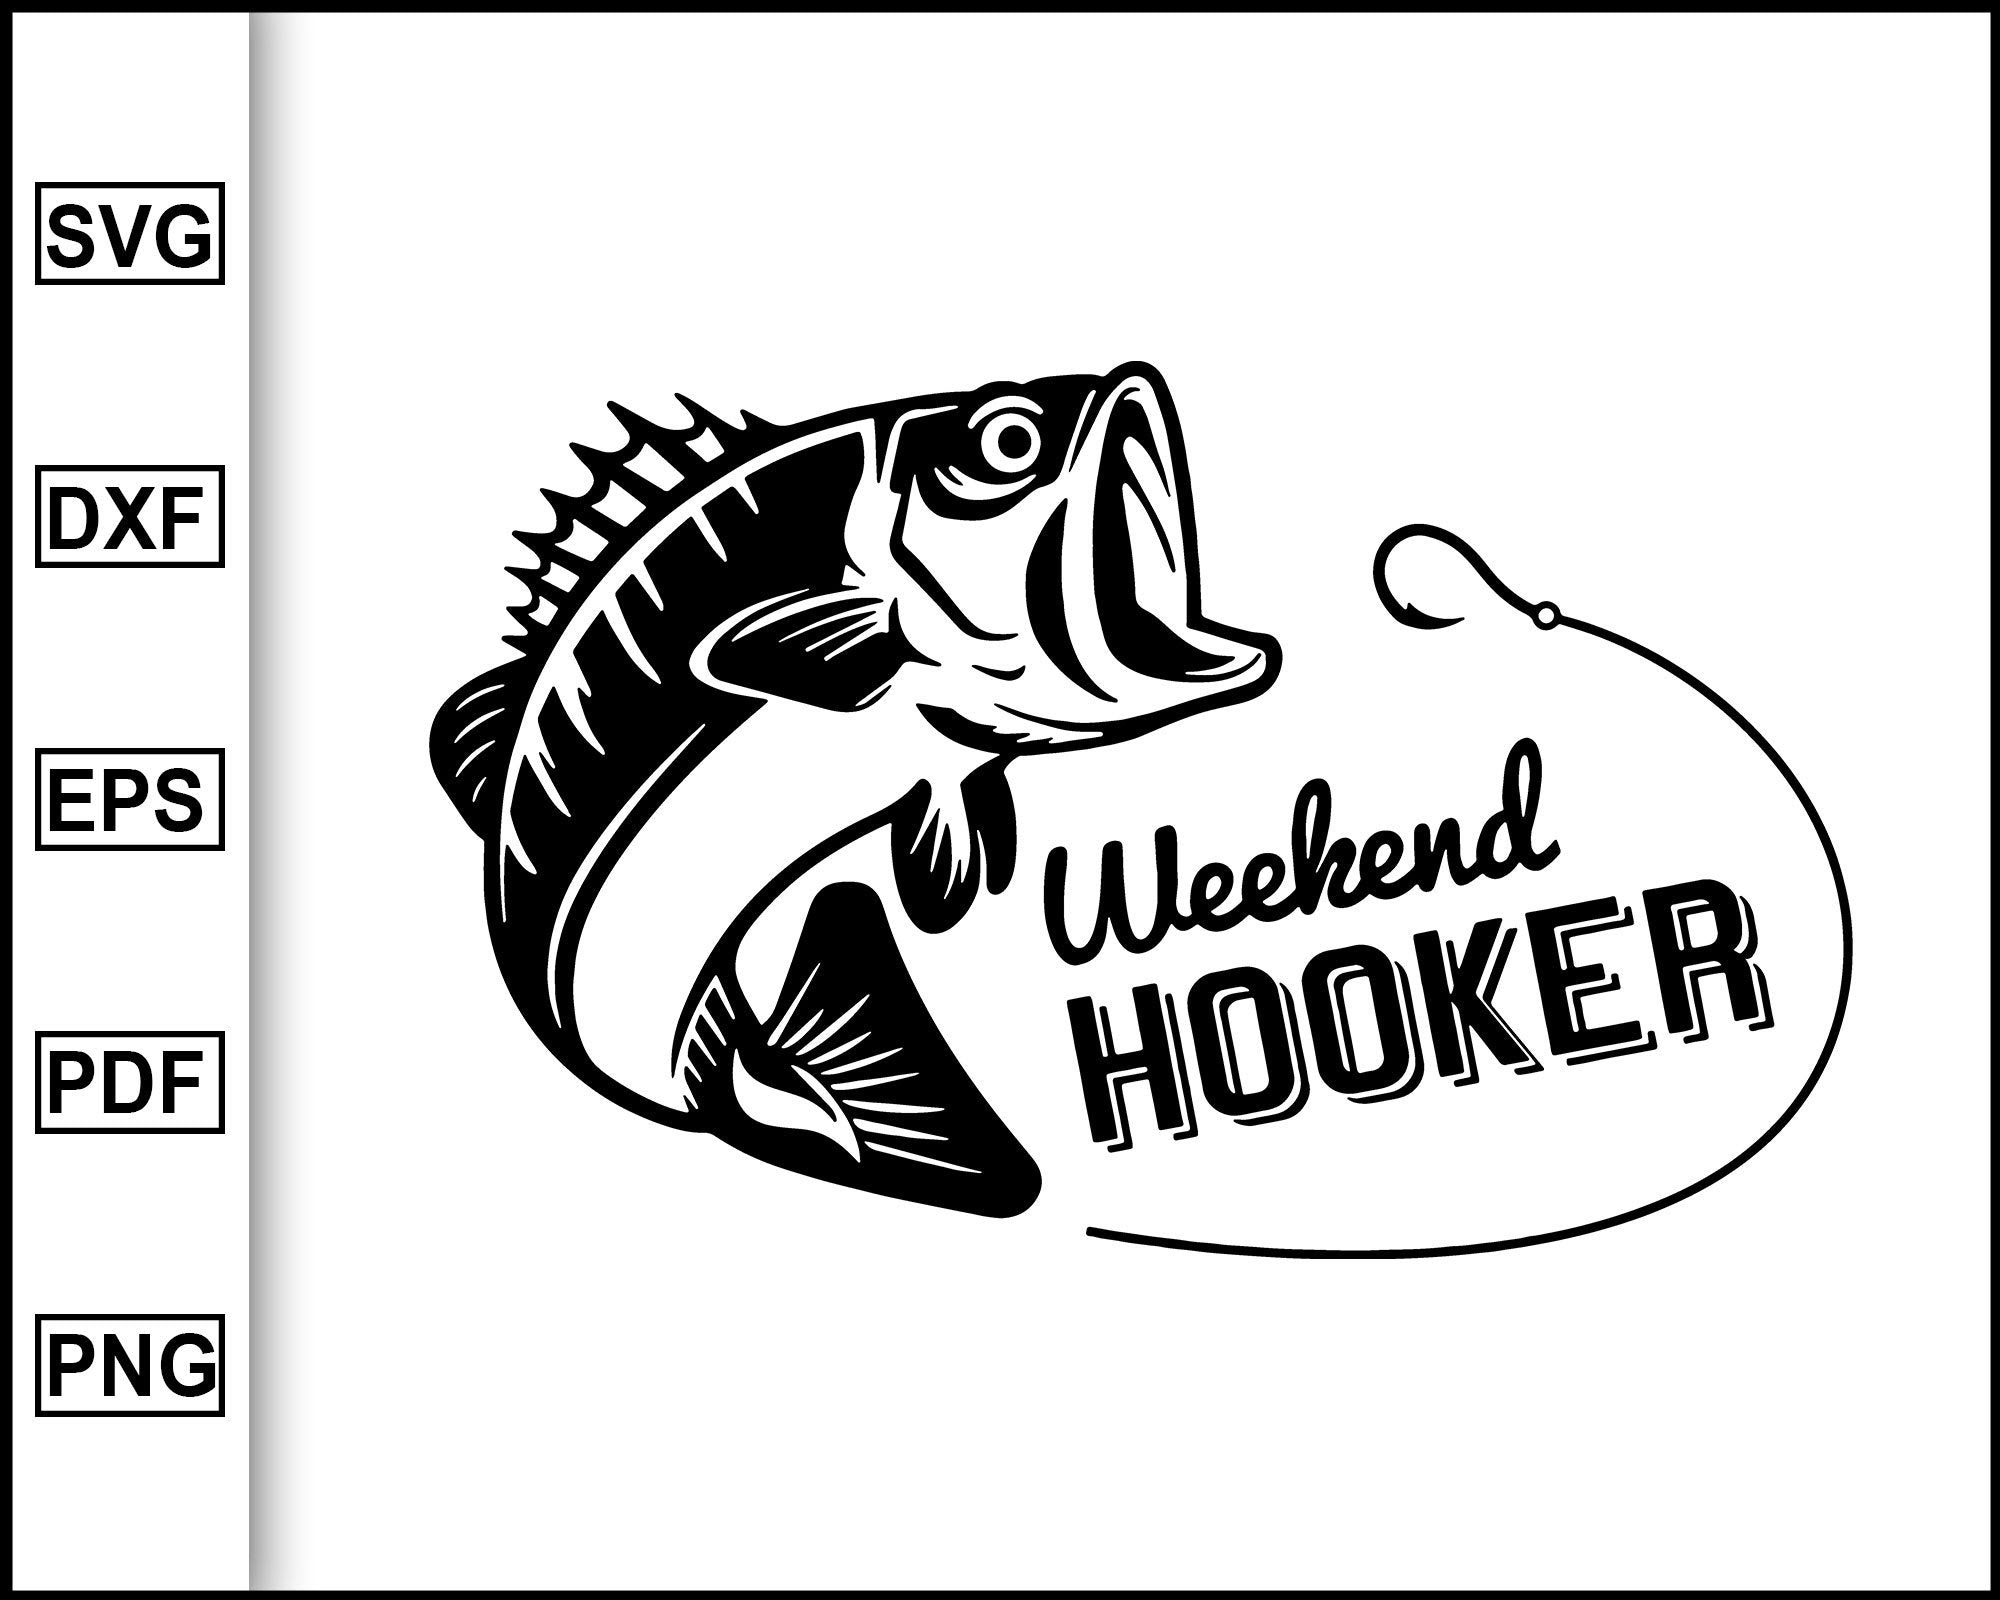 Download Weekend Hooker Svg Father S Day Svg Dad Svg Fisher Svg Funny Fishing Editable Svg File